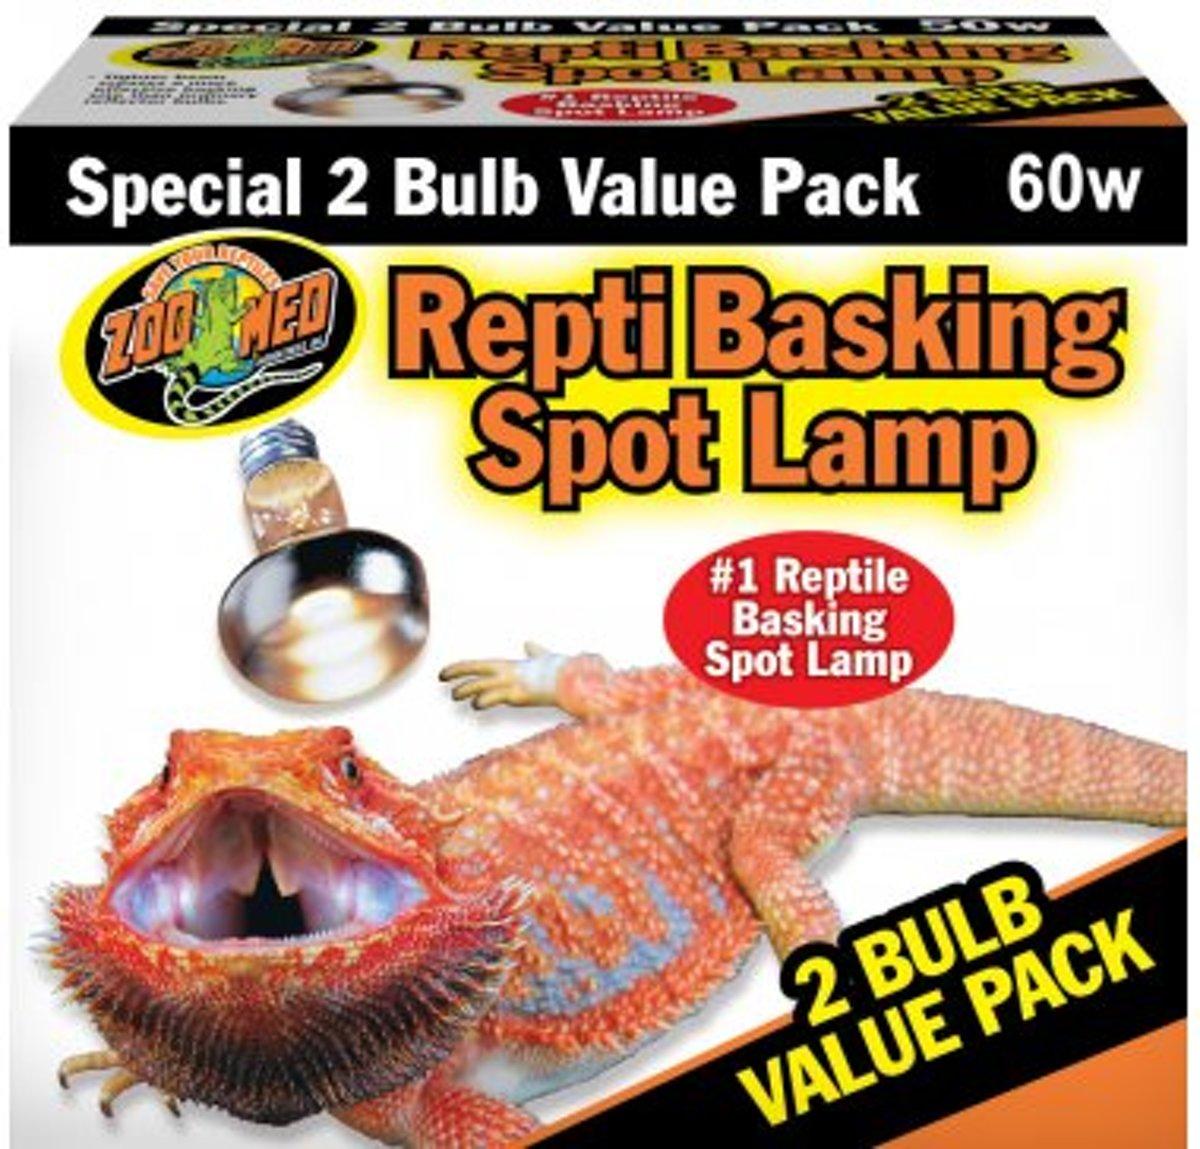 ZM Repti Basking Spot Lamp 60 w. Value Pack